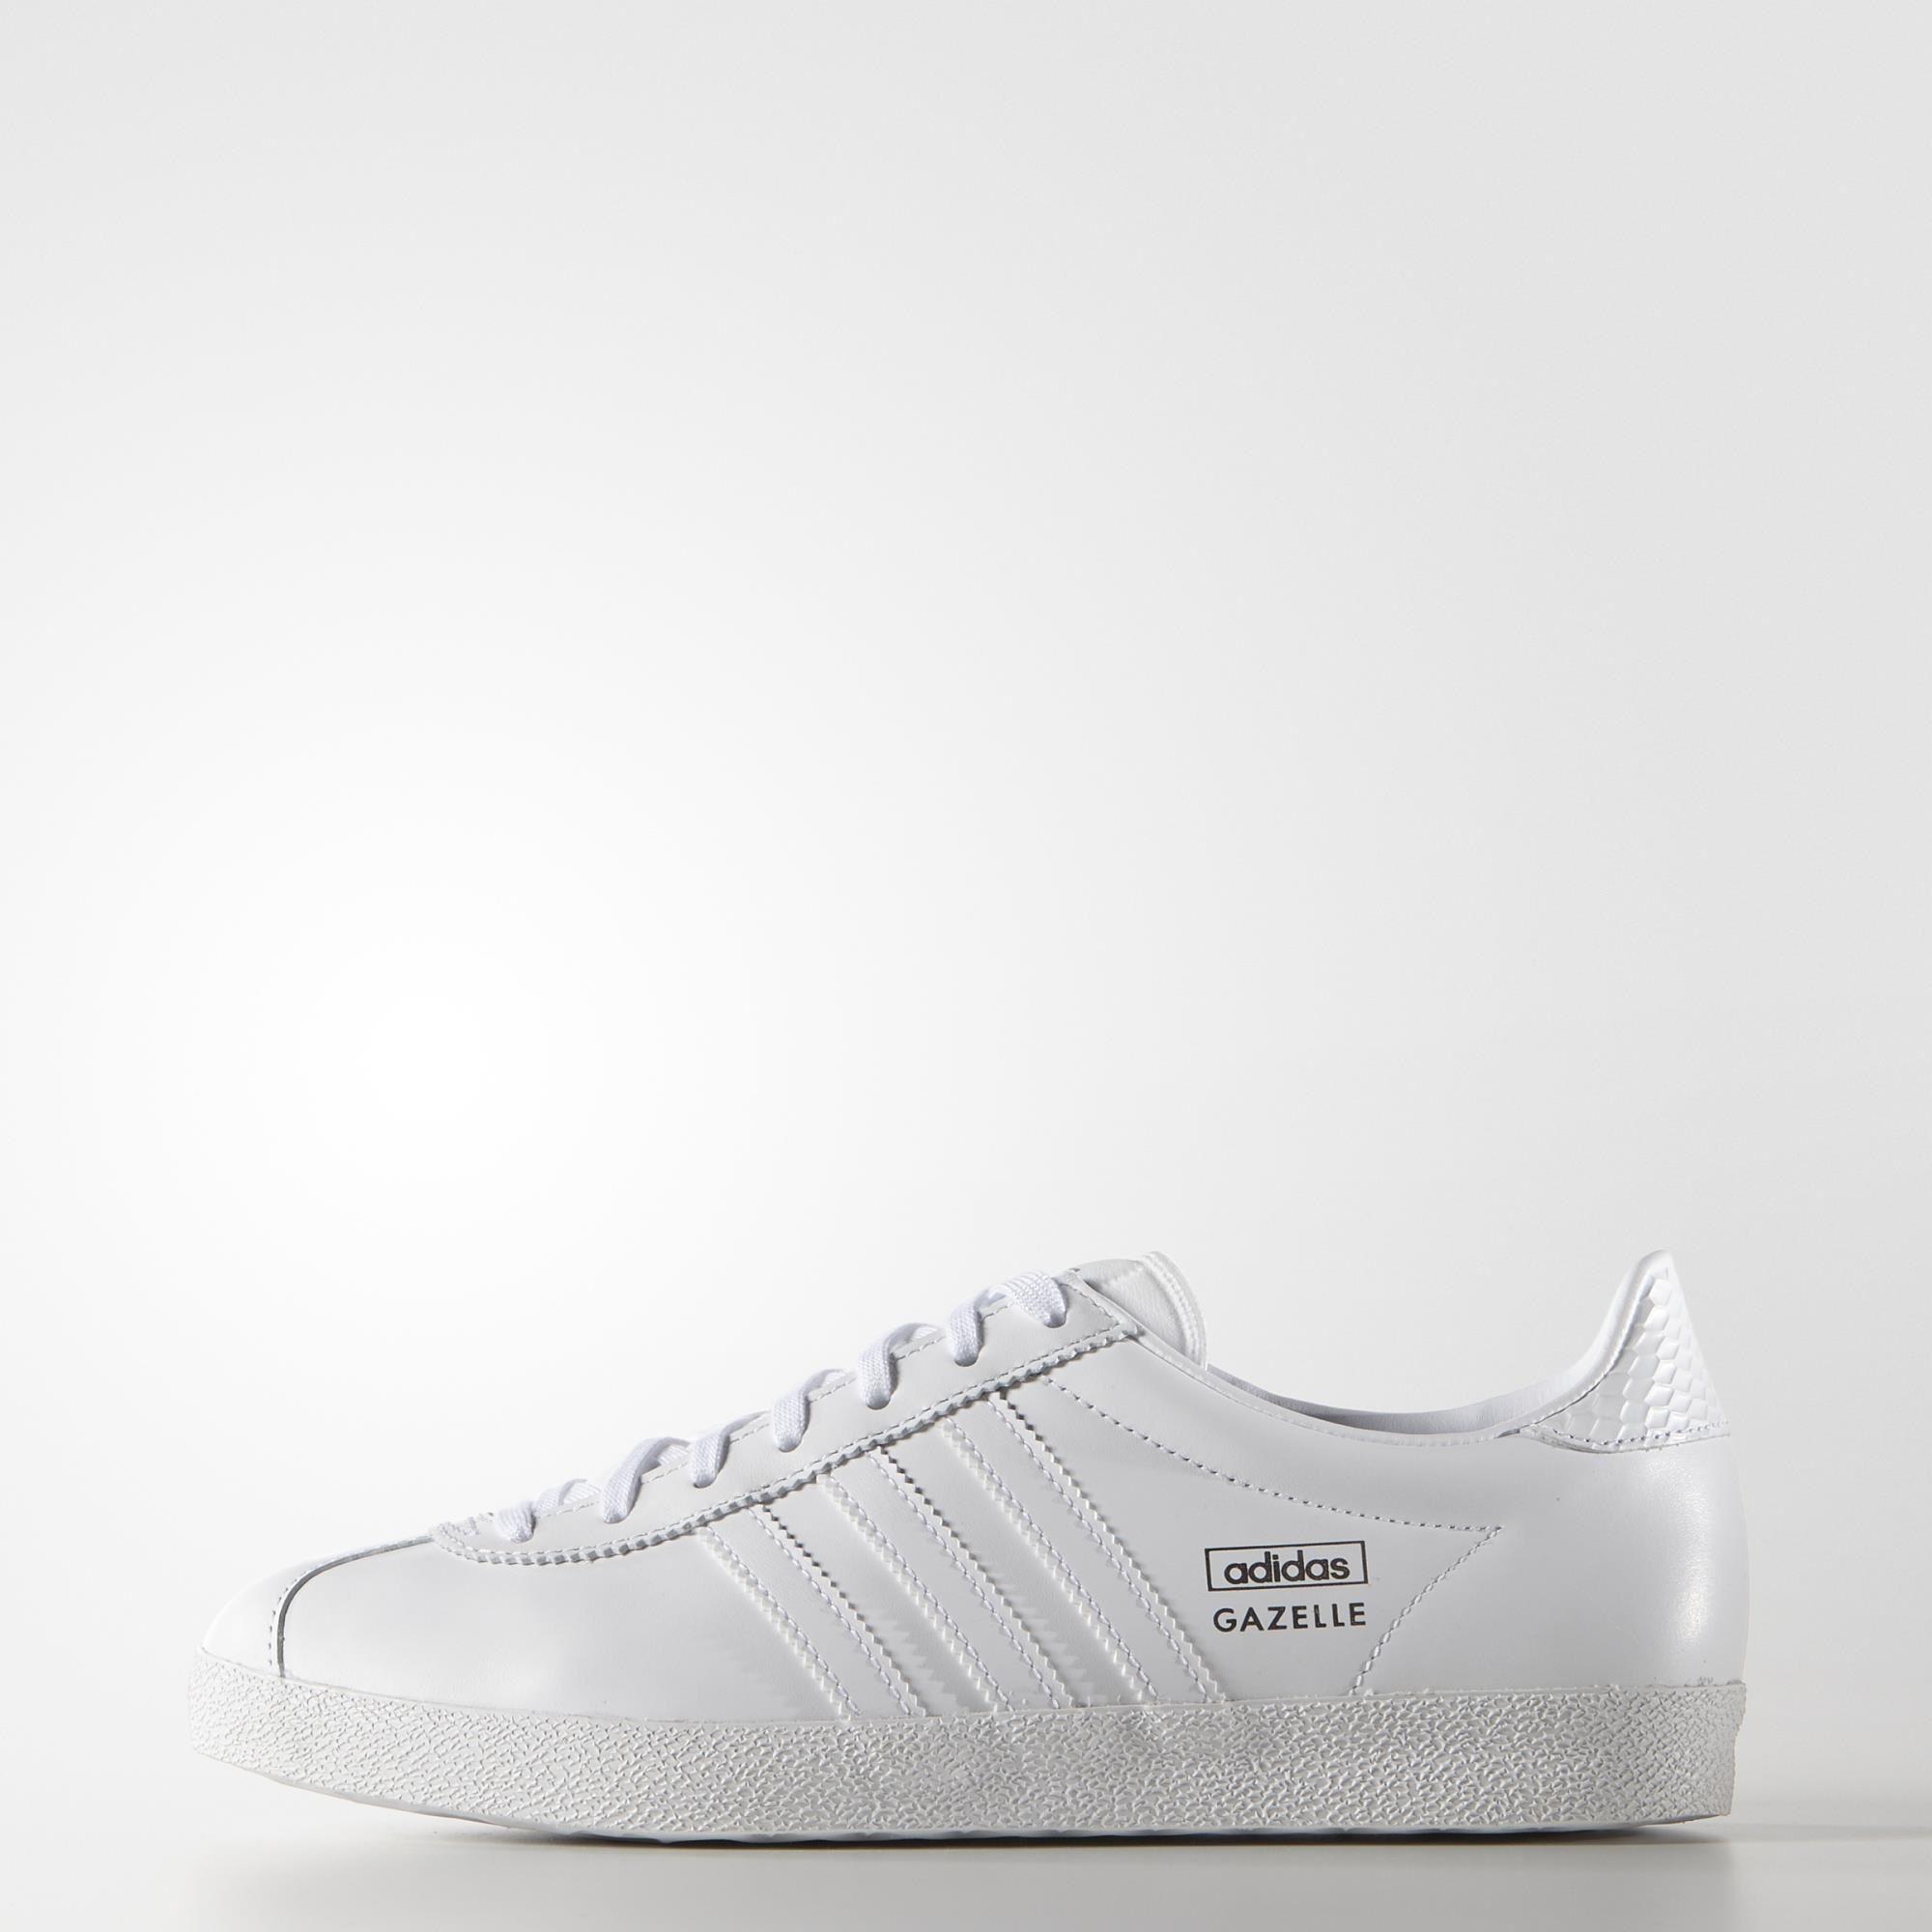 46a94d7821 adidas GAZELLE OG W - White